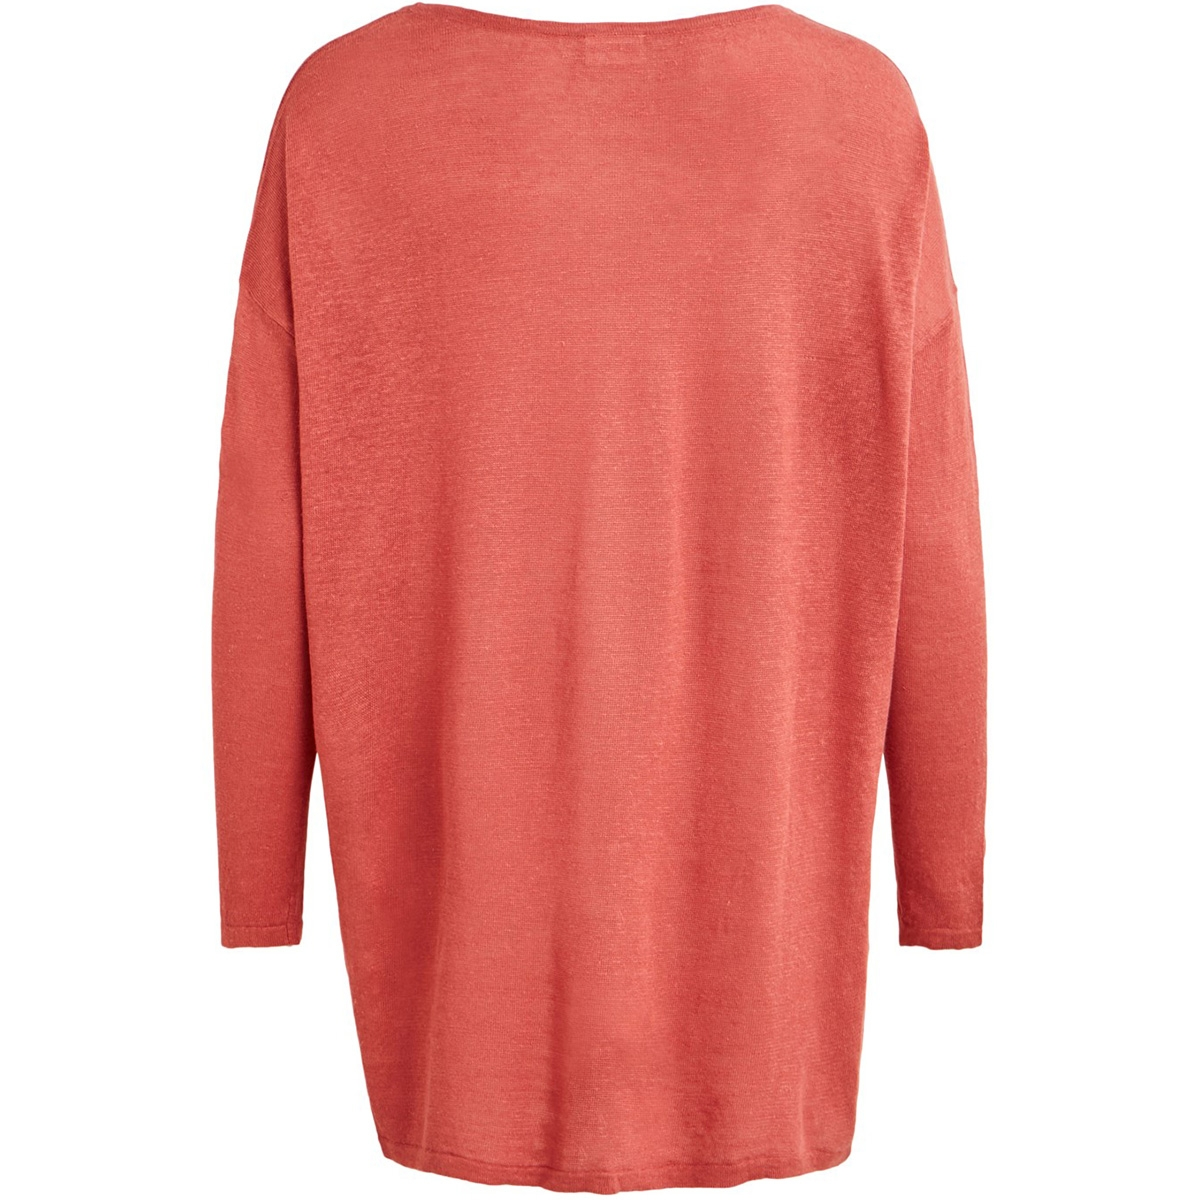 vifilak knit l/s oversize tunic - f 14055935 vila tuniek dusty cedar/melange